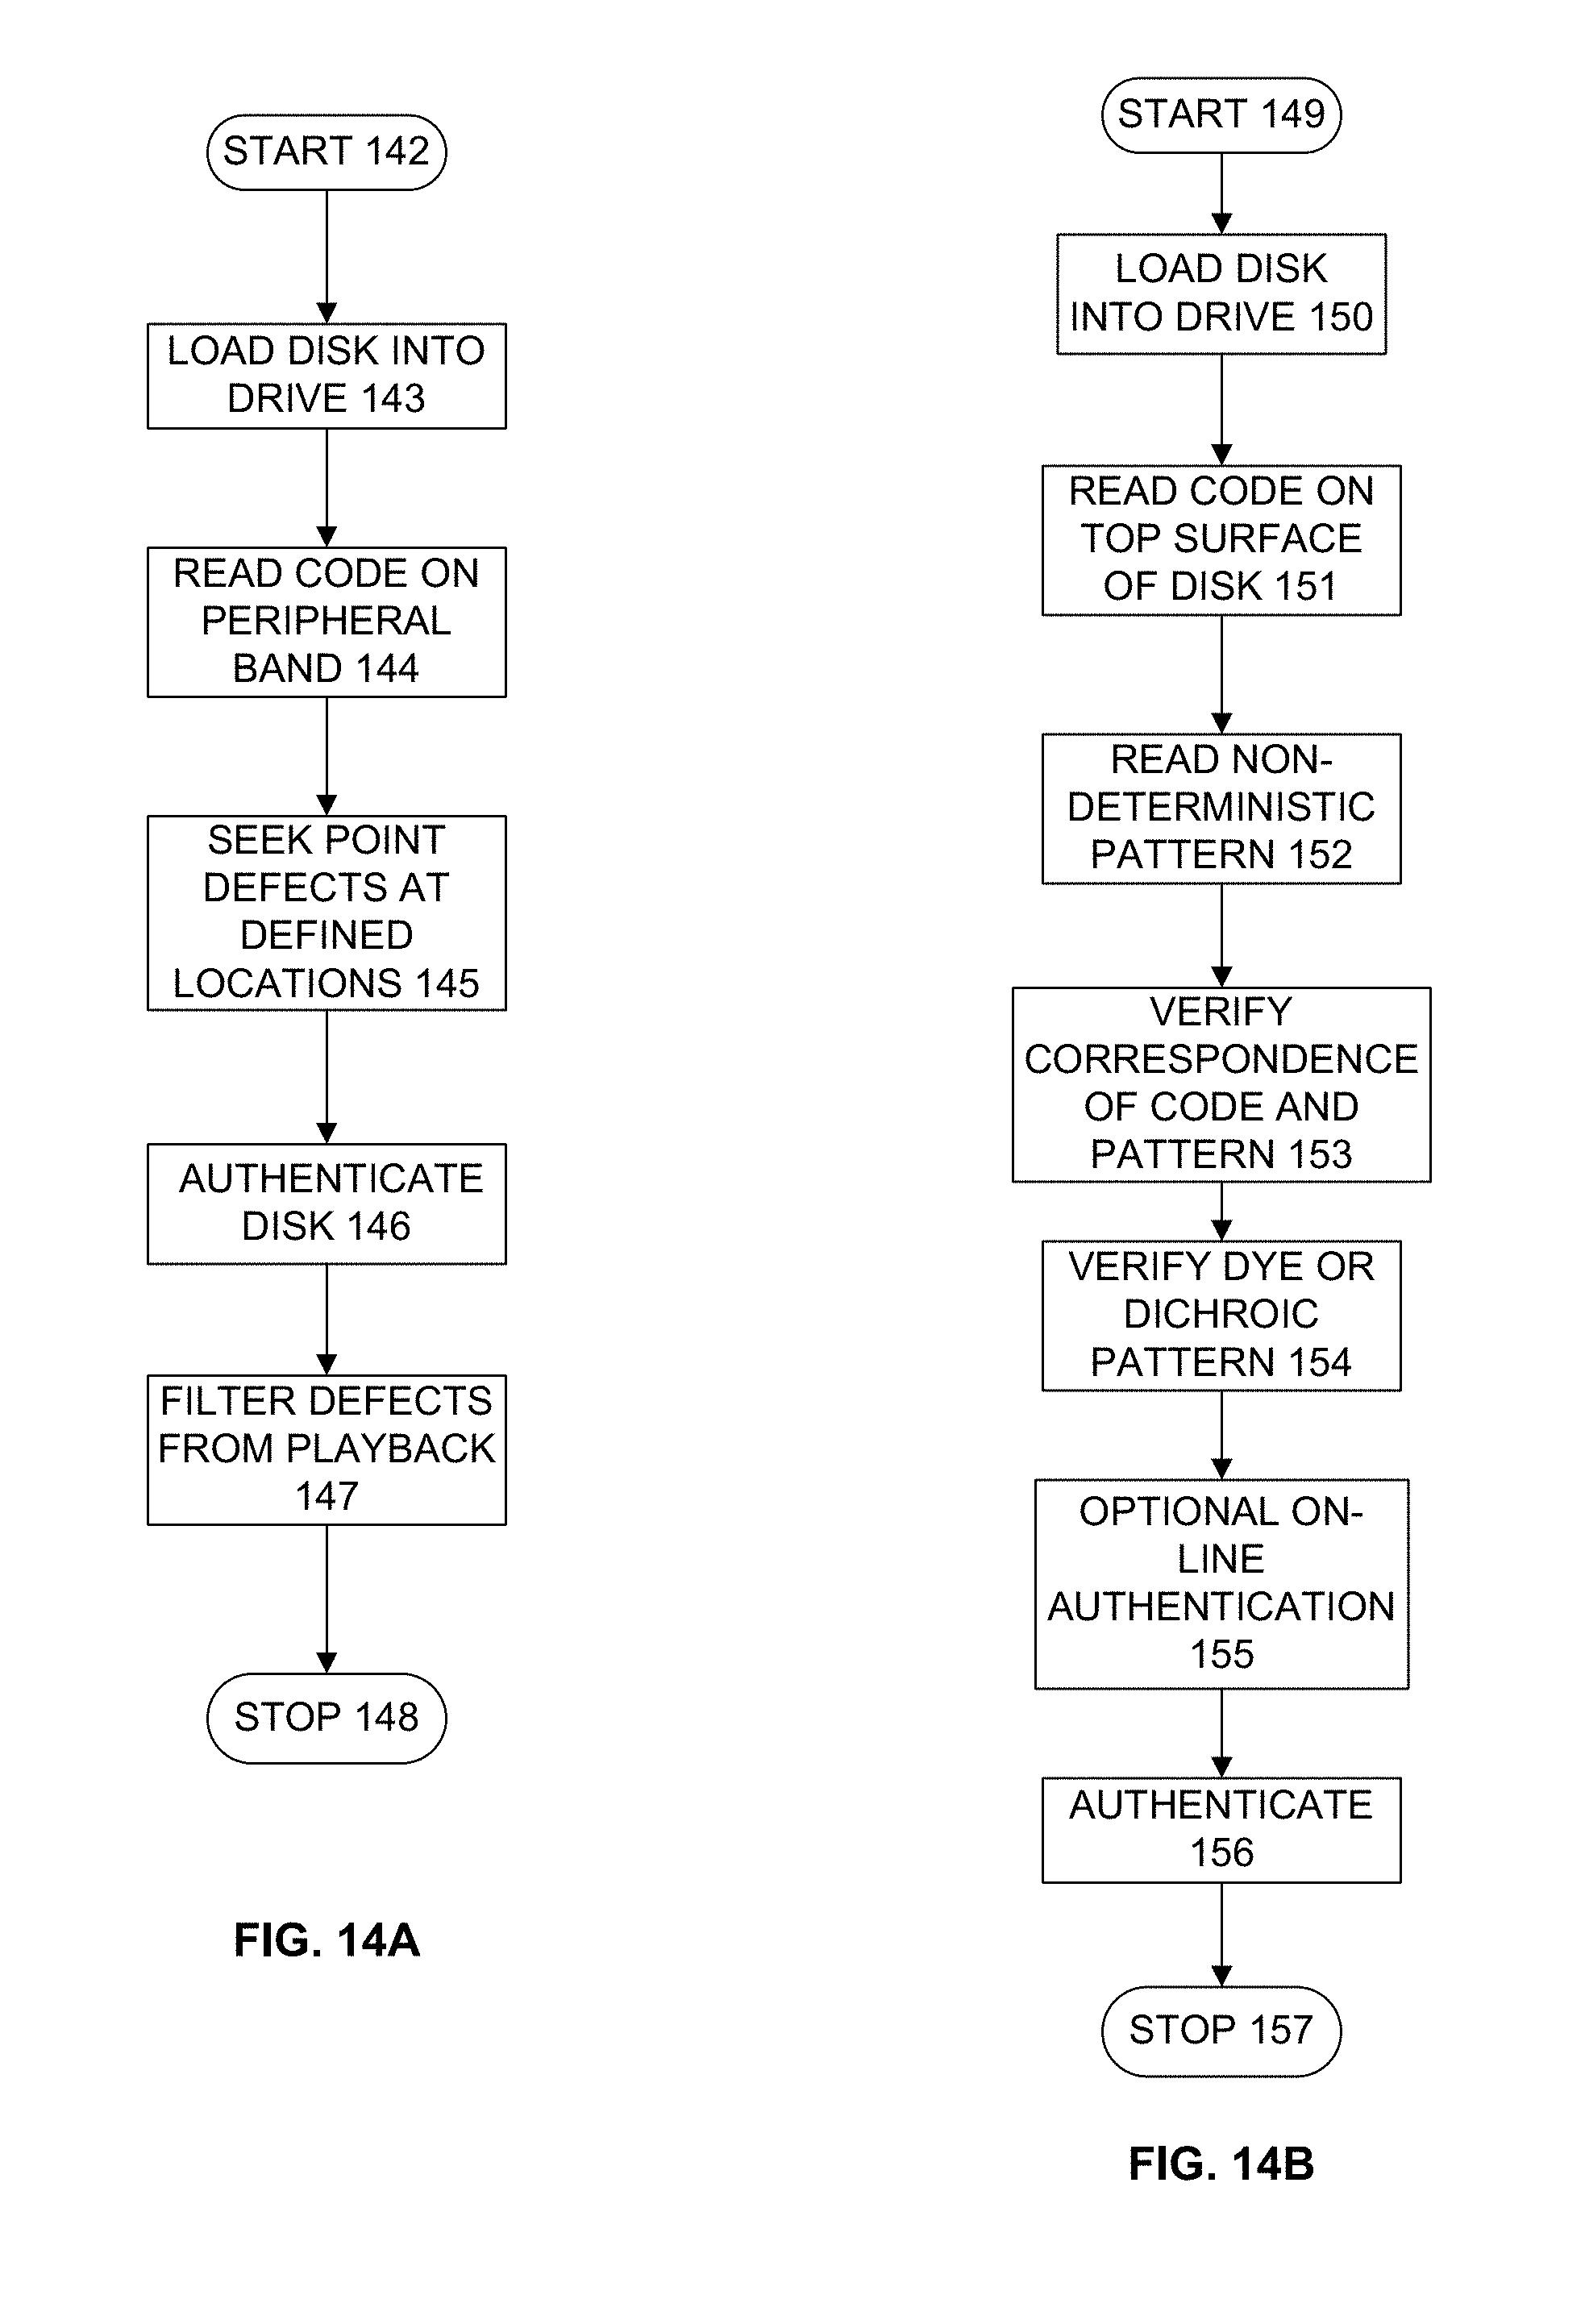 Patent US 9,846,814 B1